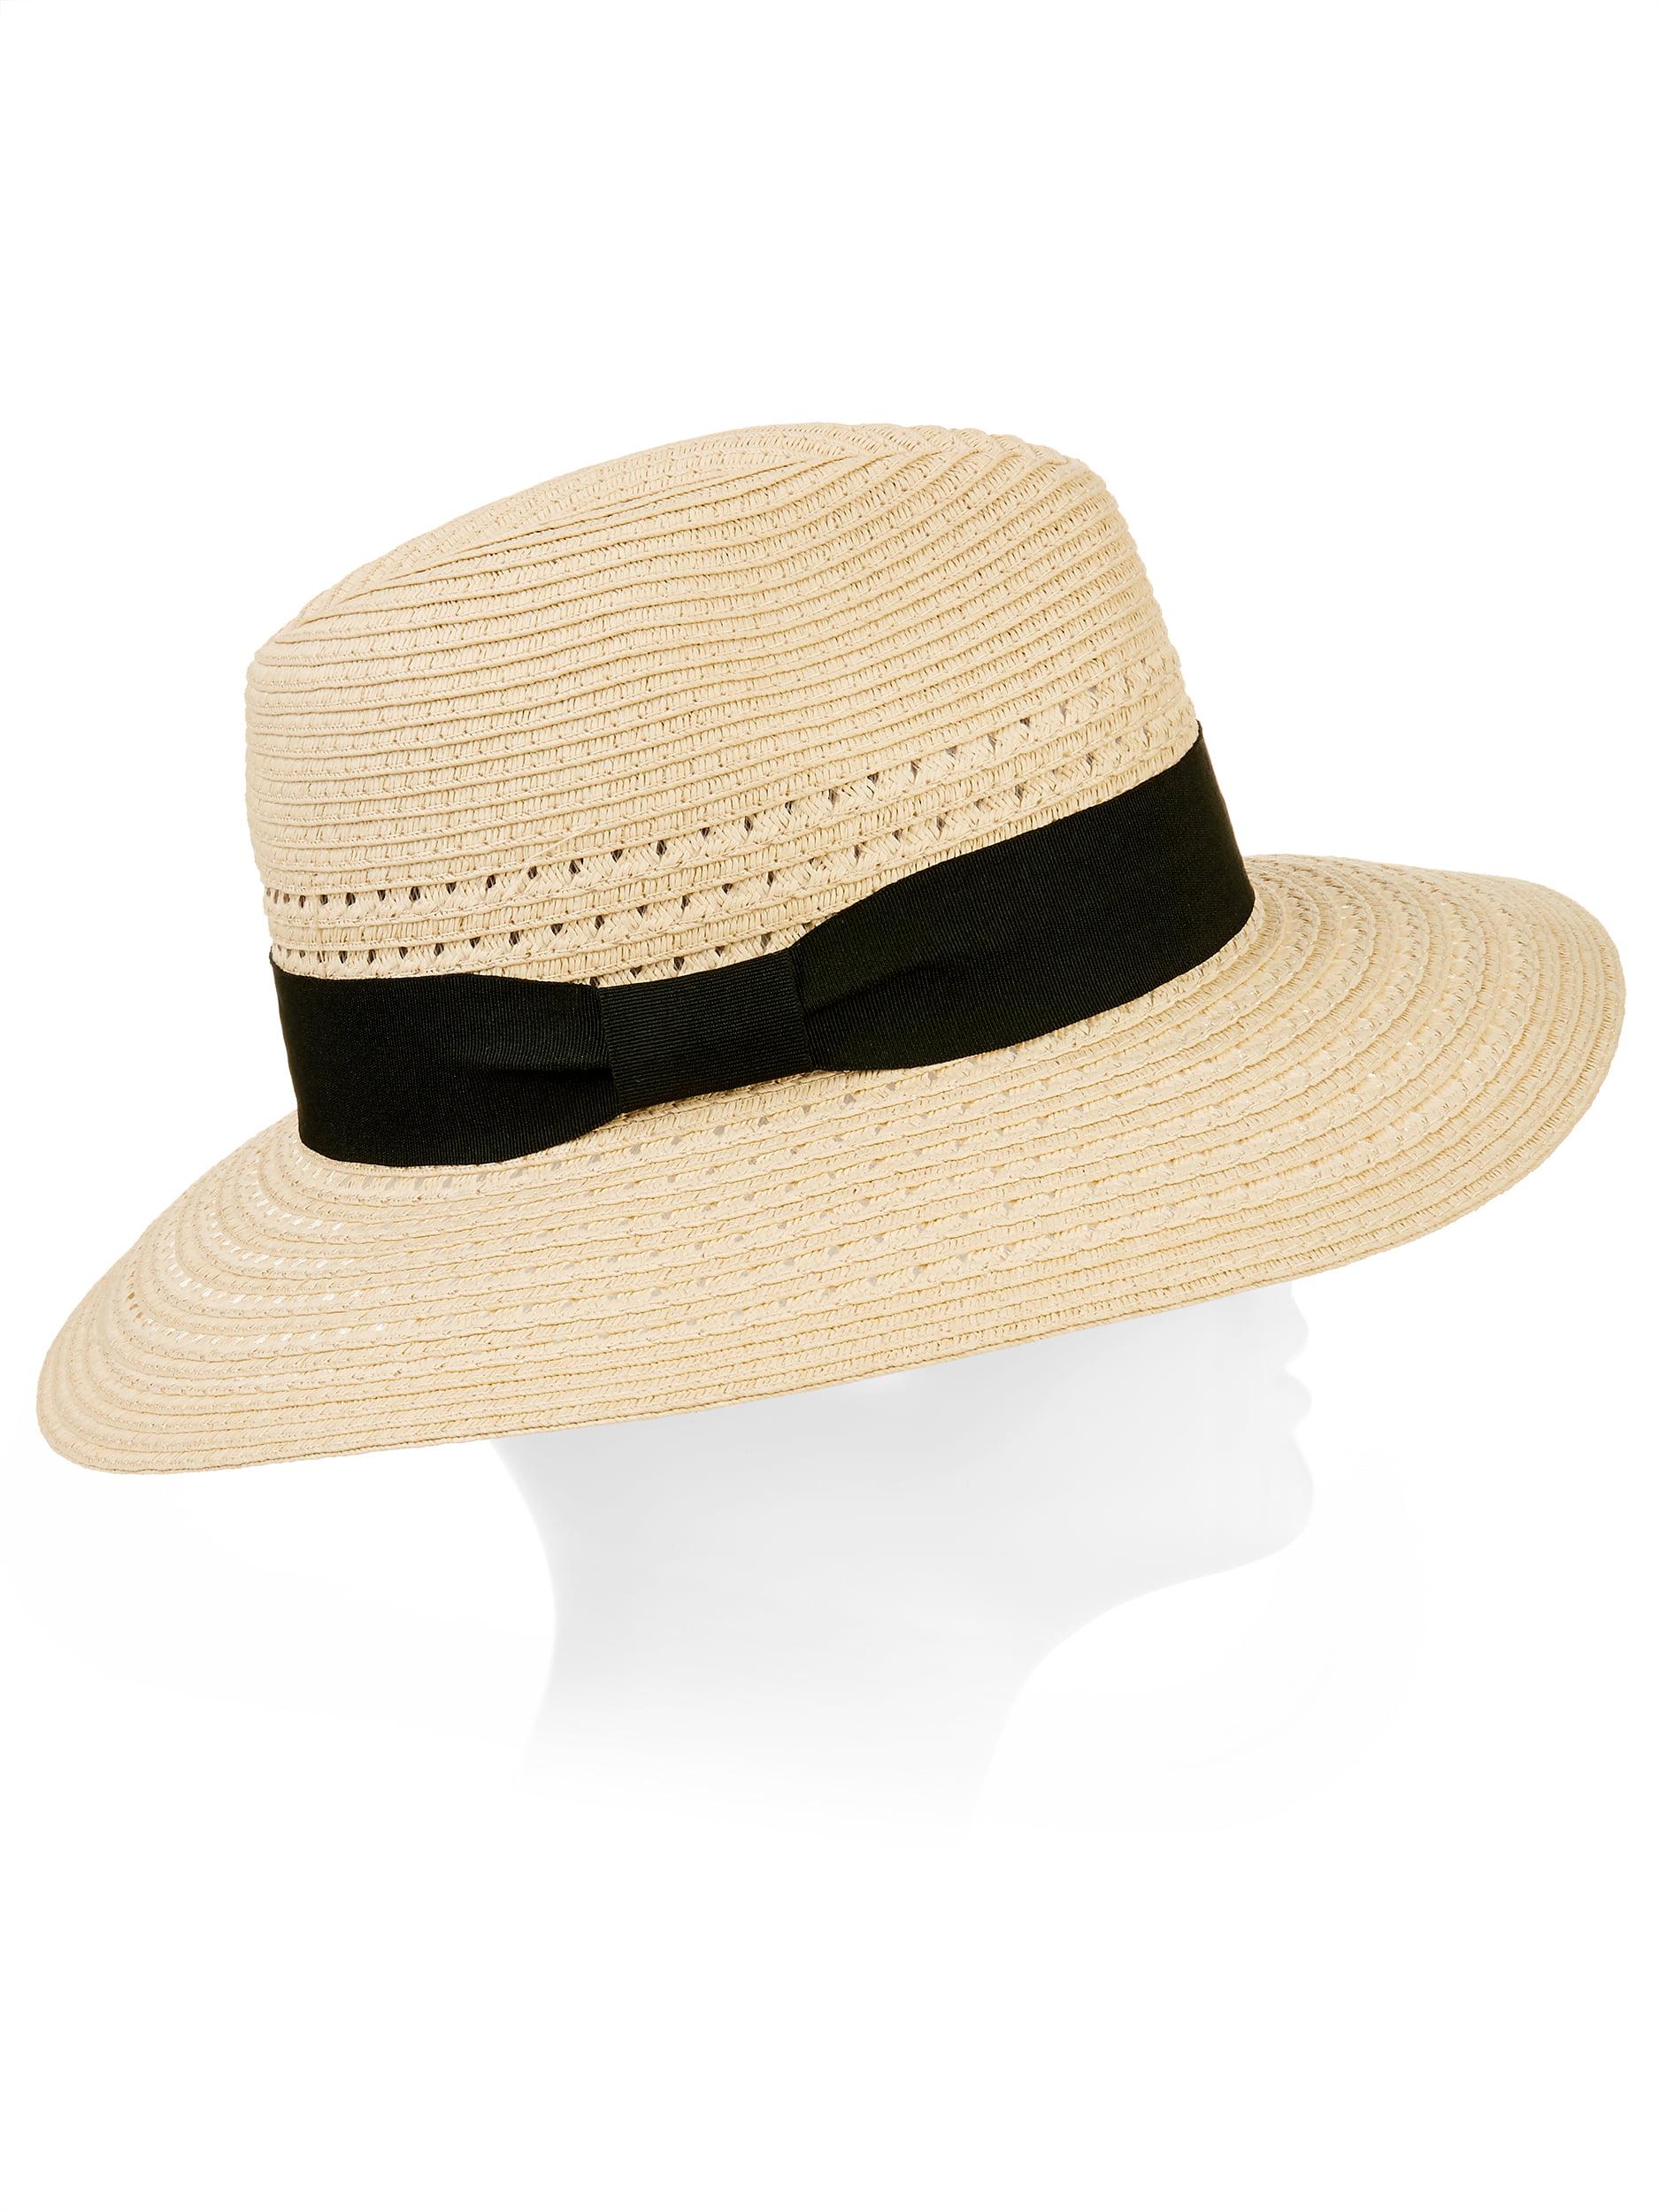 Eliza May Rose Women's Openweave Rancher Hat